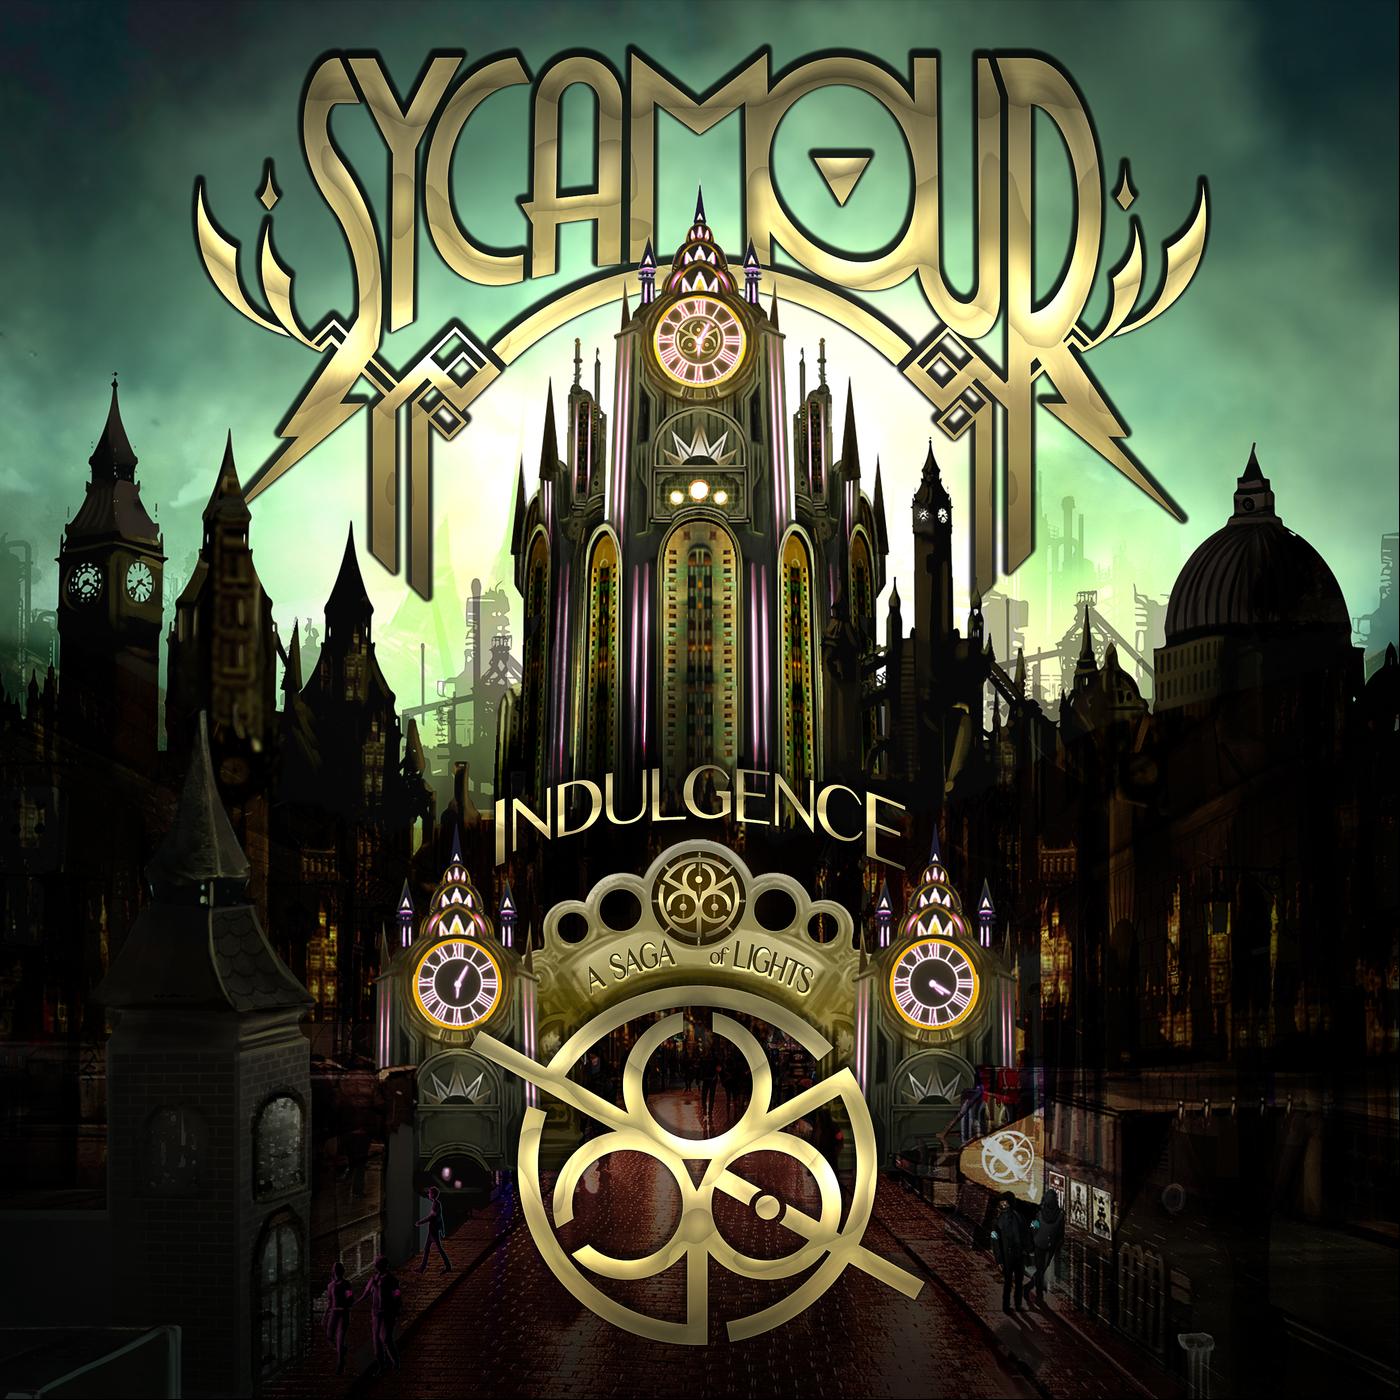 SycAmour - Indulgence: A Saga of Lights (2014)